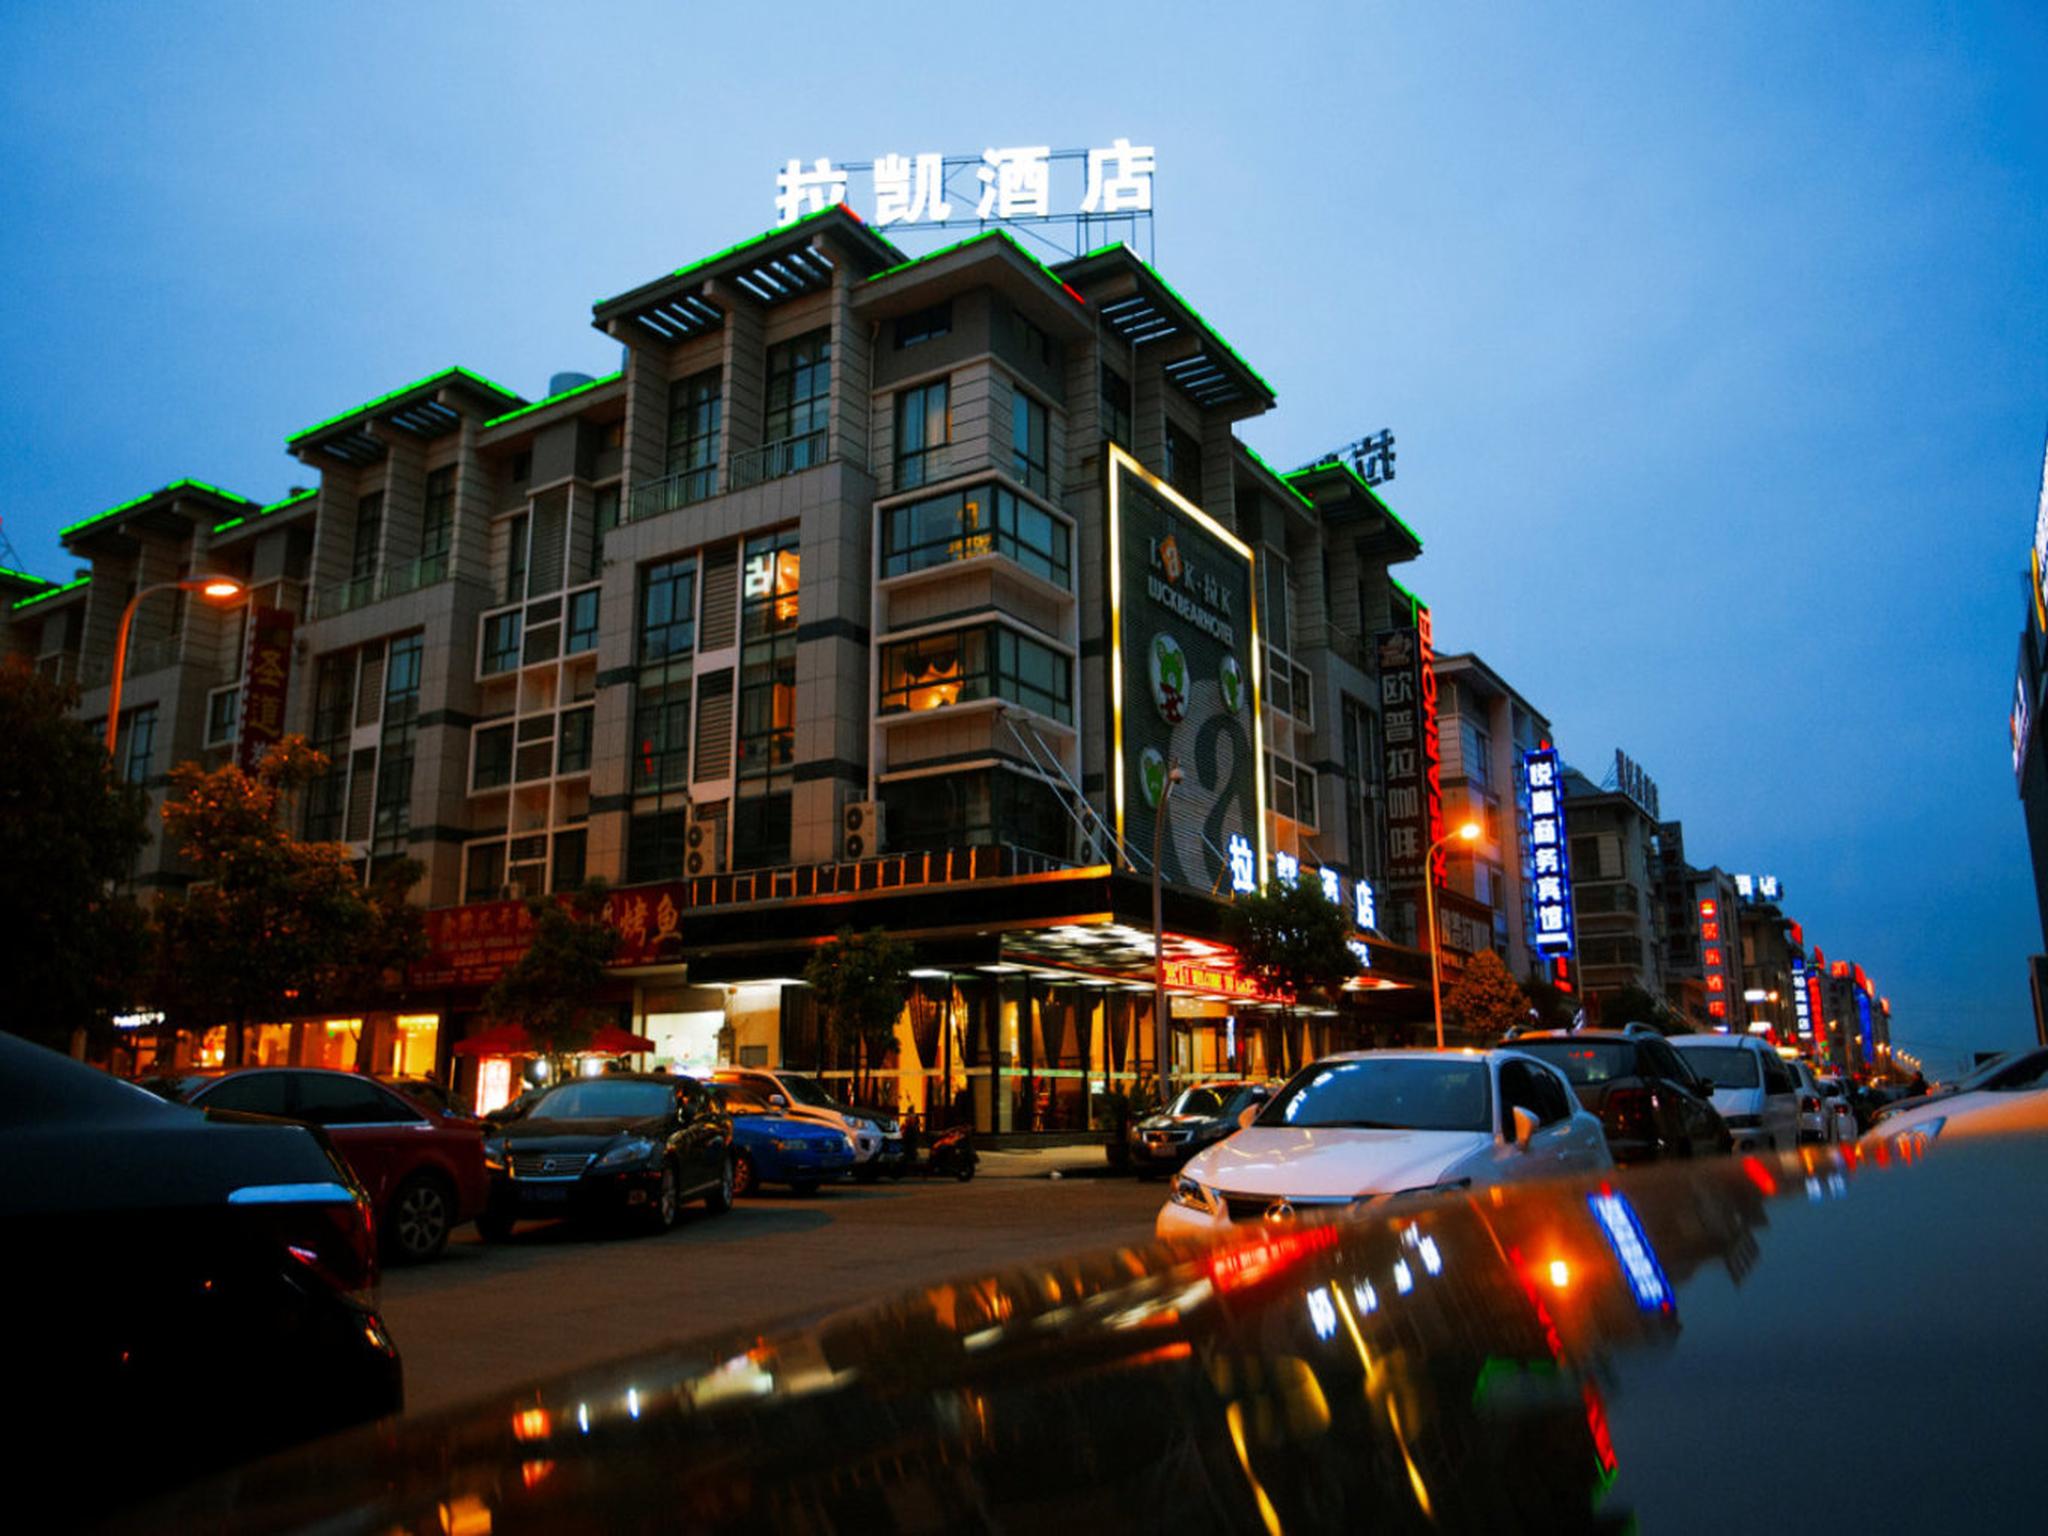 Yiwu Luckbear Hotel,Jinhua